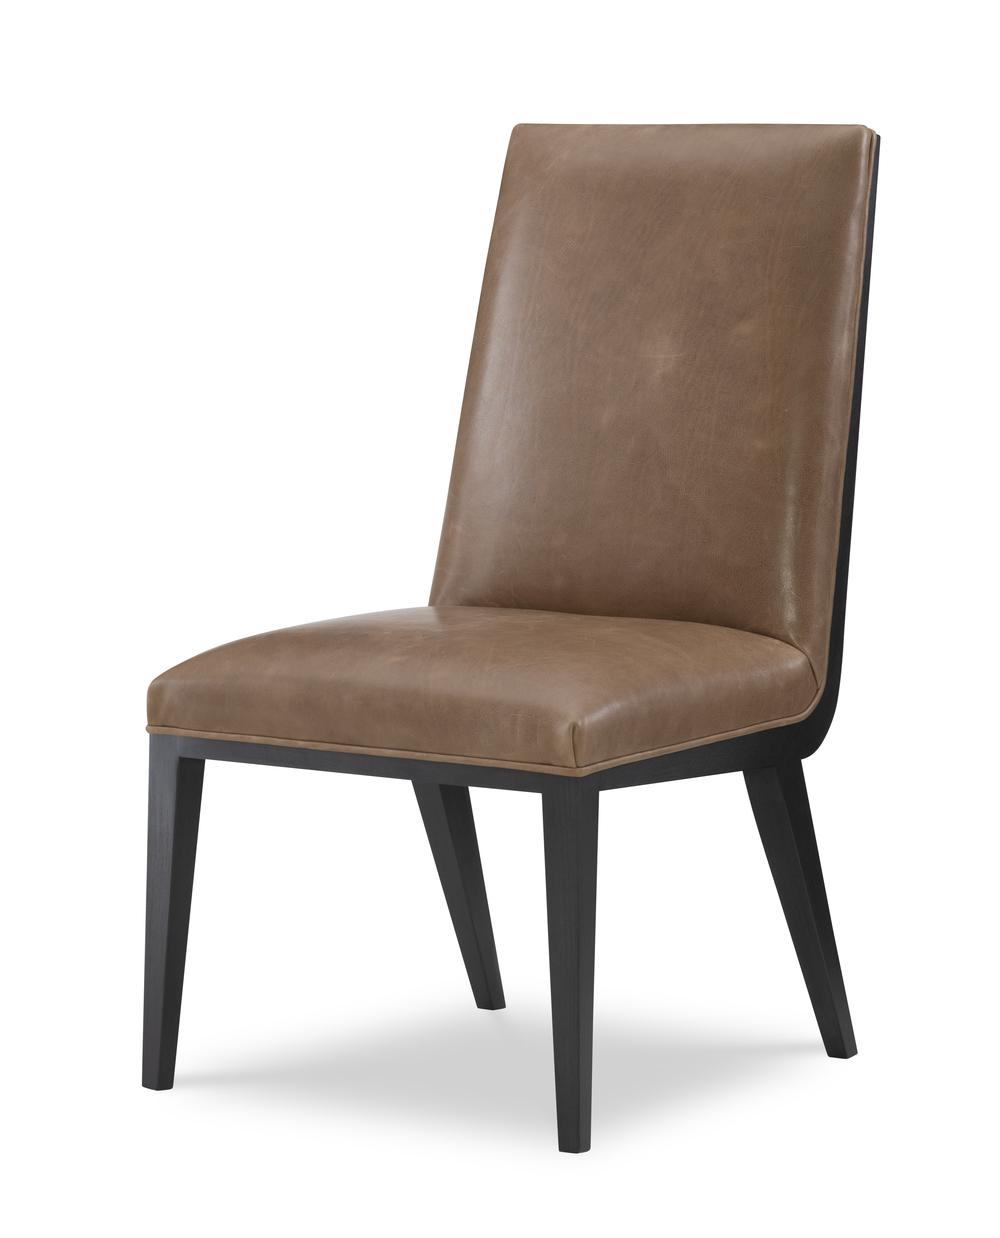 Wesley Hall - Vance Side Chair